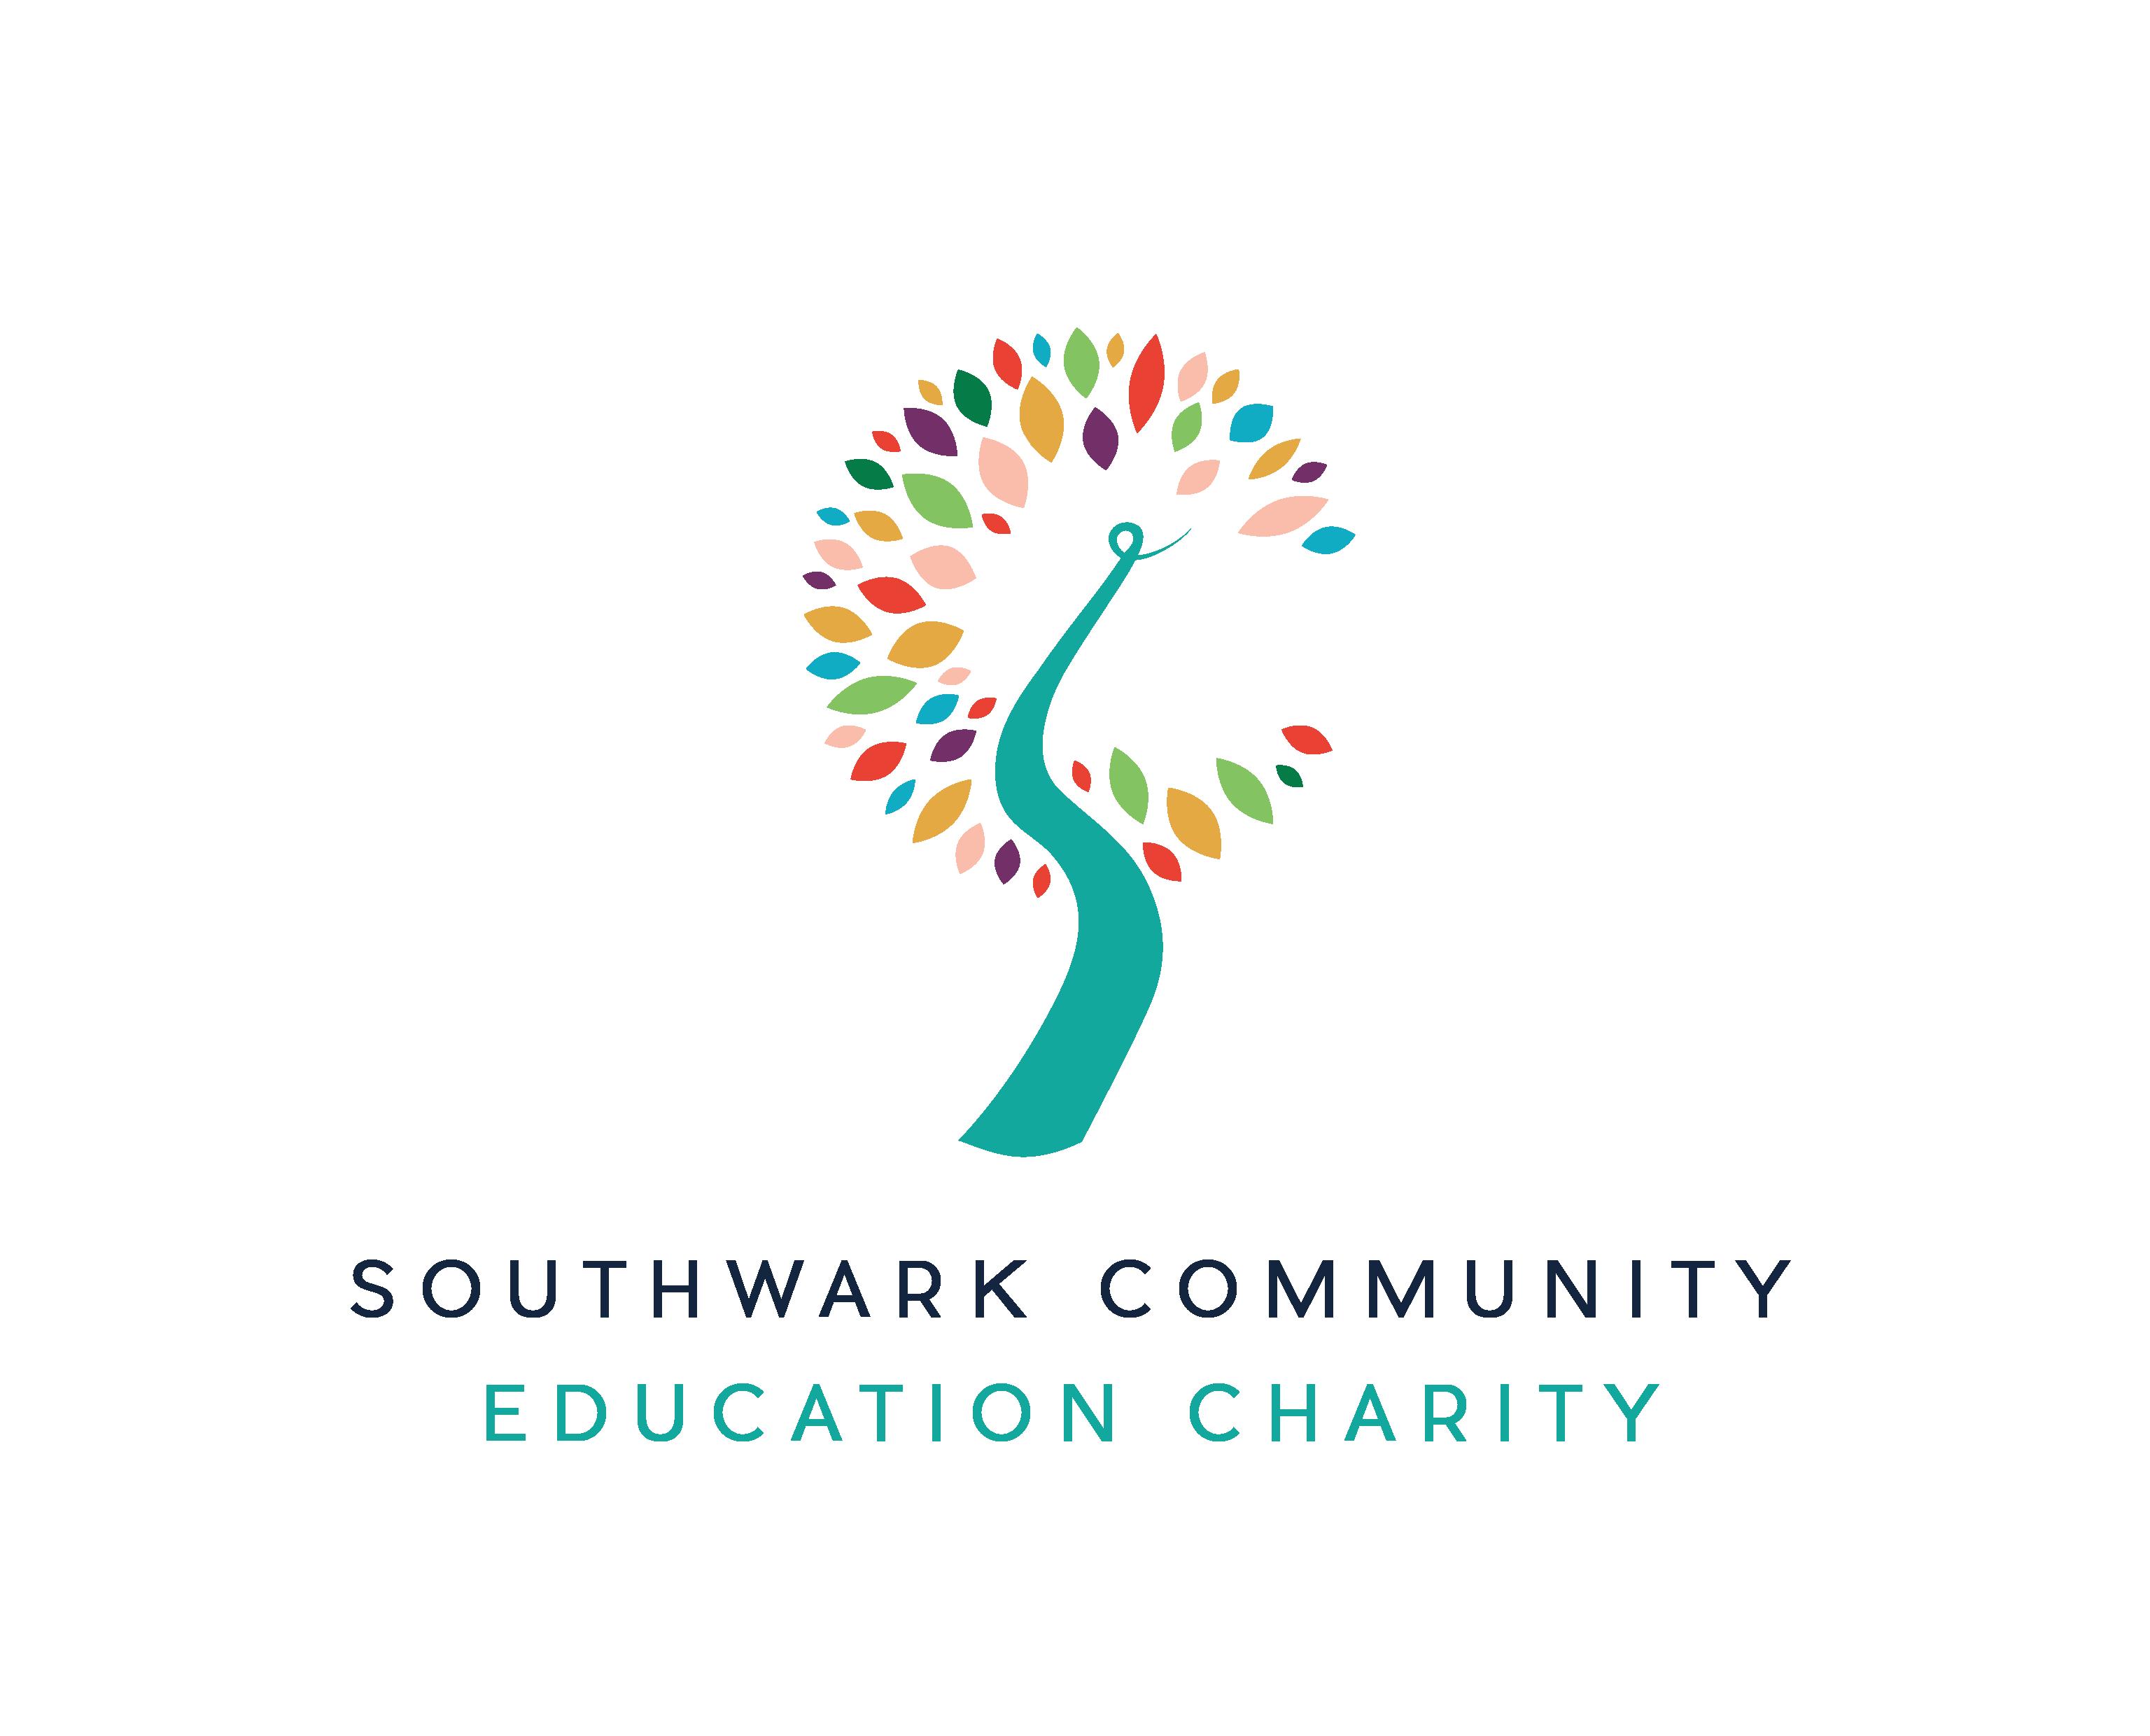 Southwark Community Education Charity